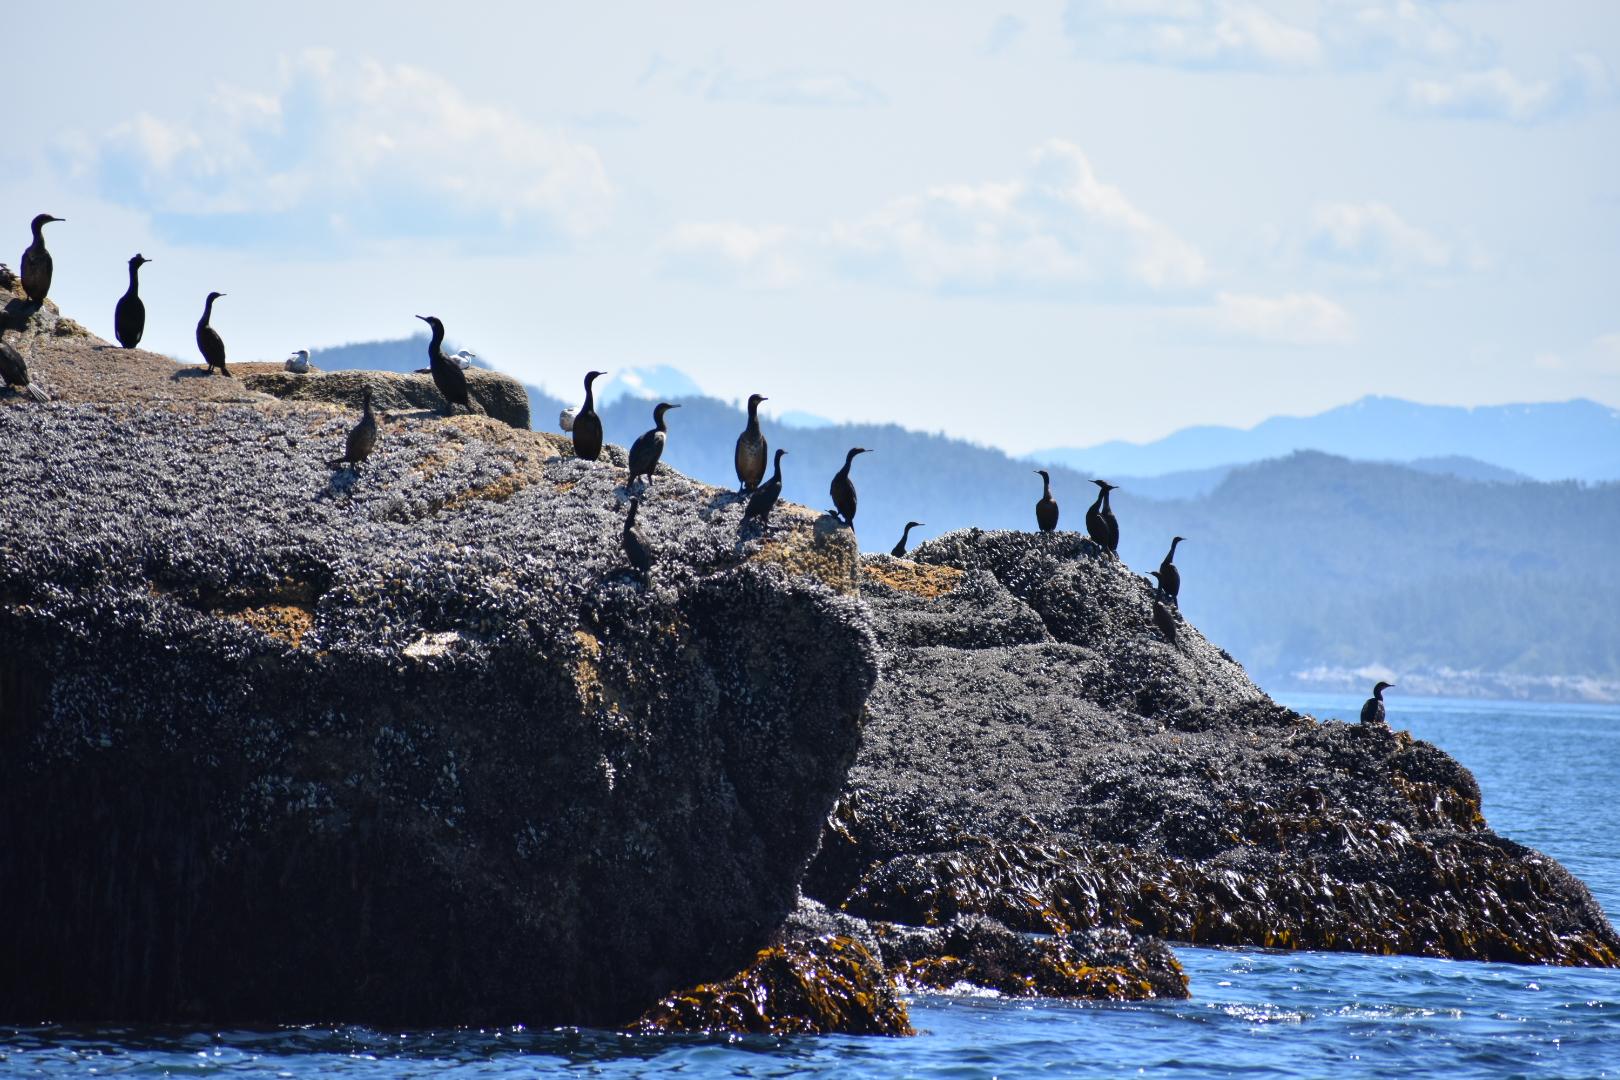 Pelagic Cormorants in Queen Charlotte Sound.